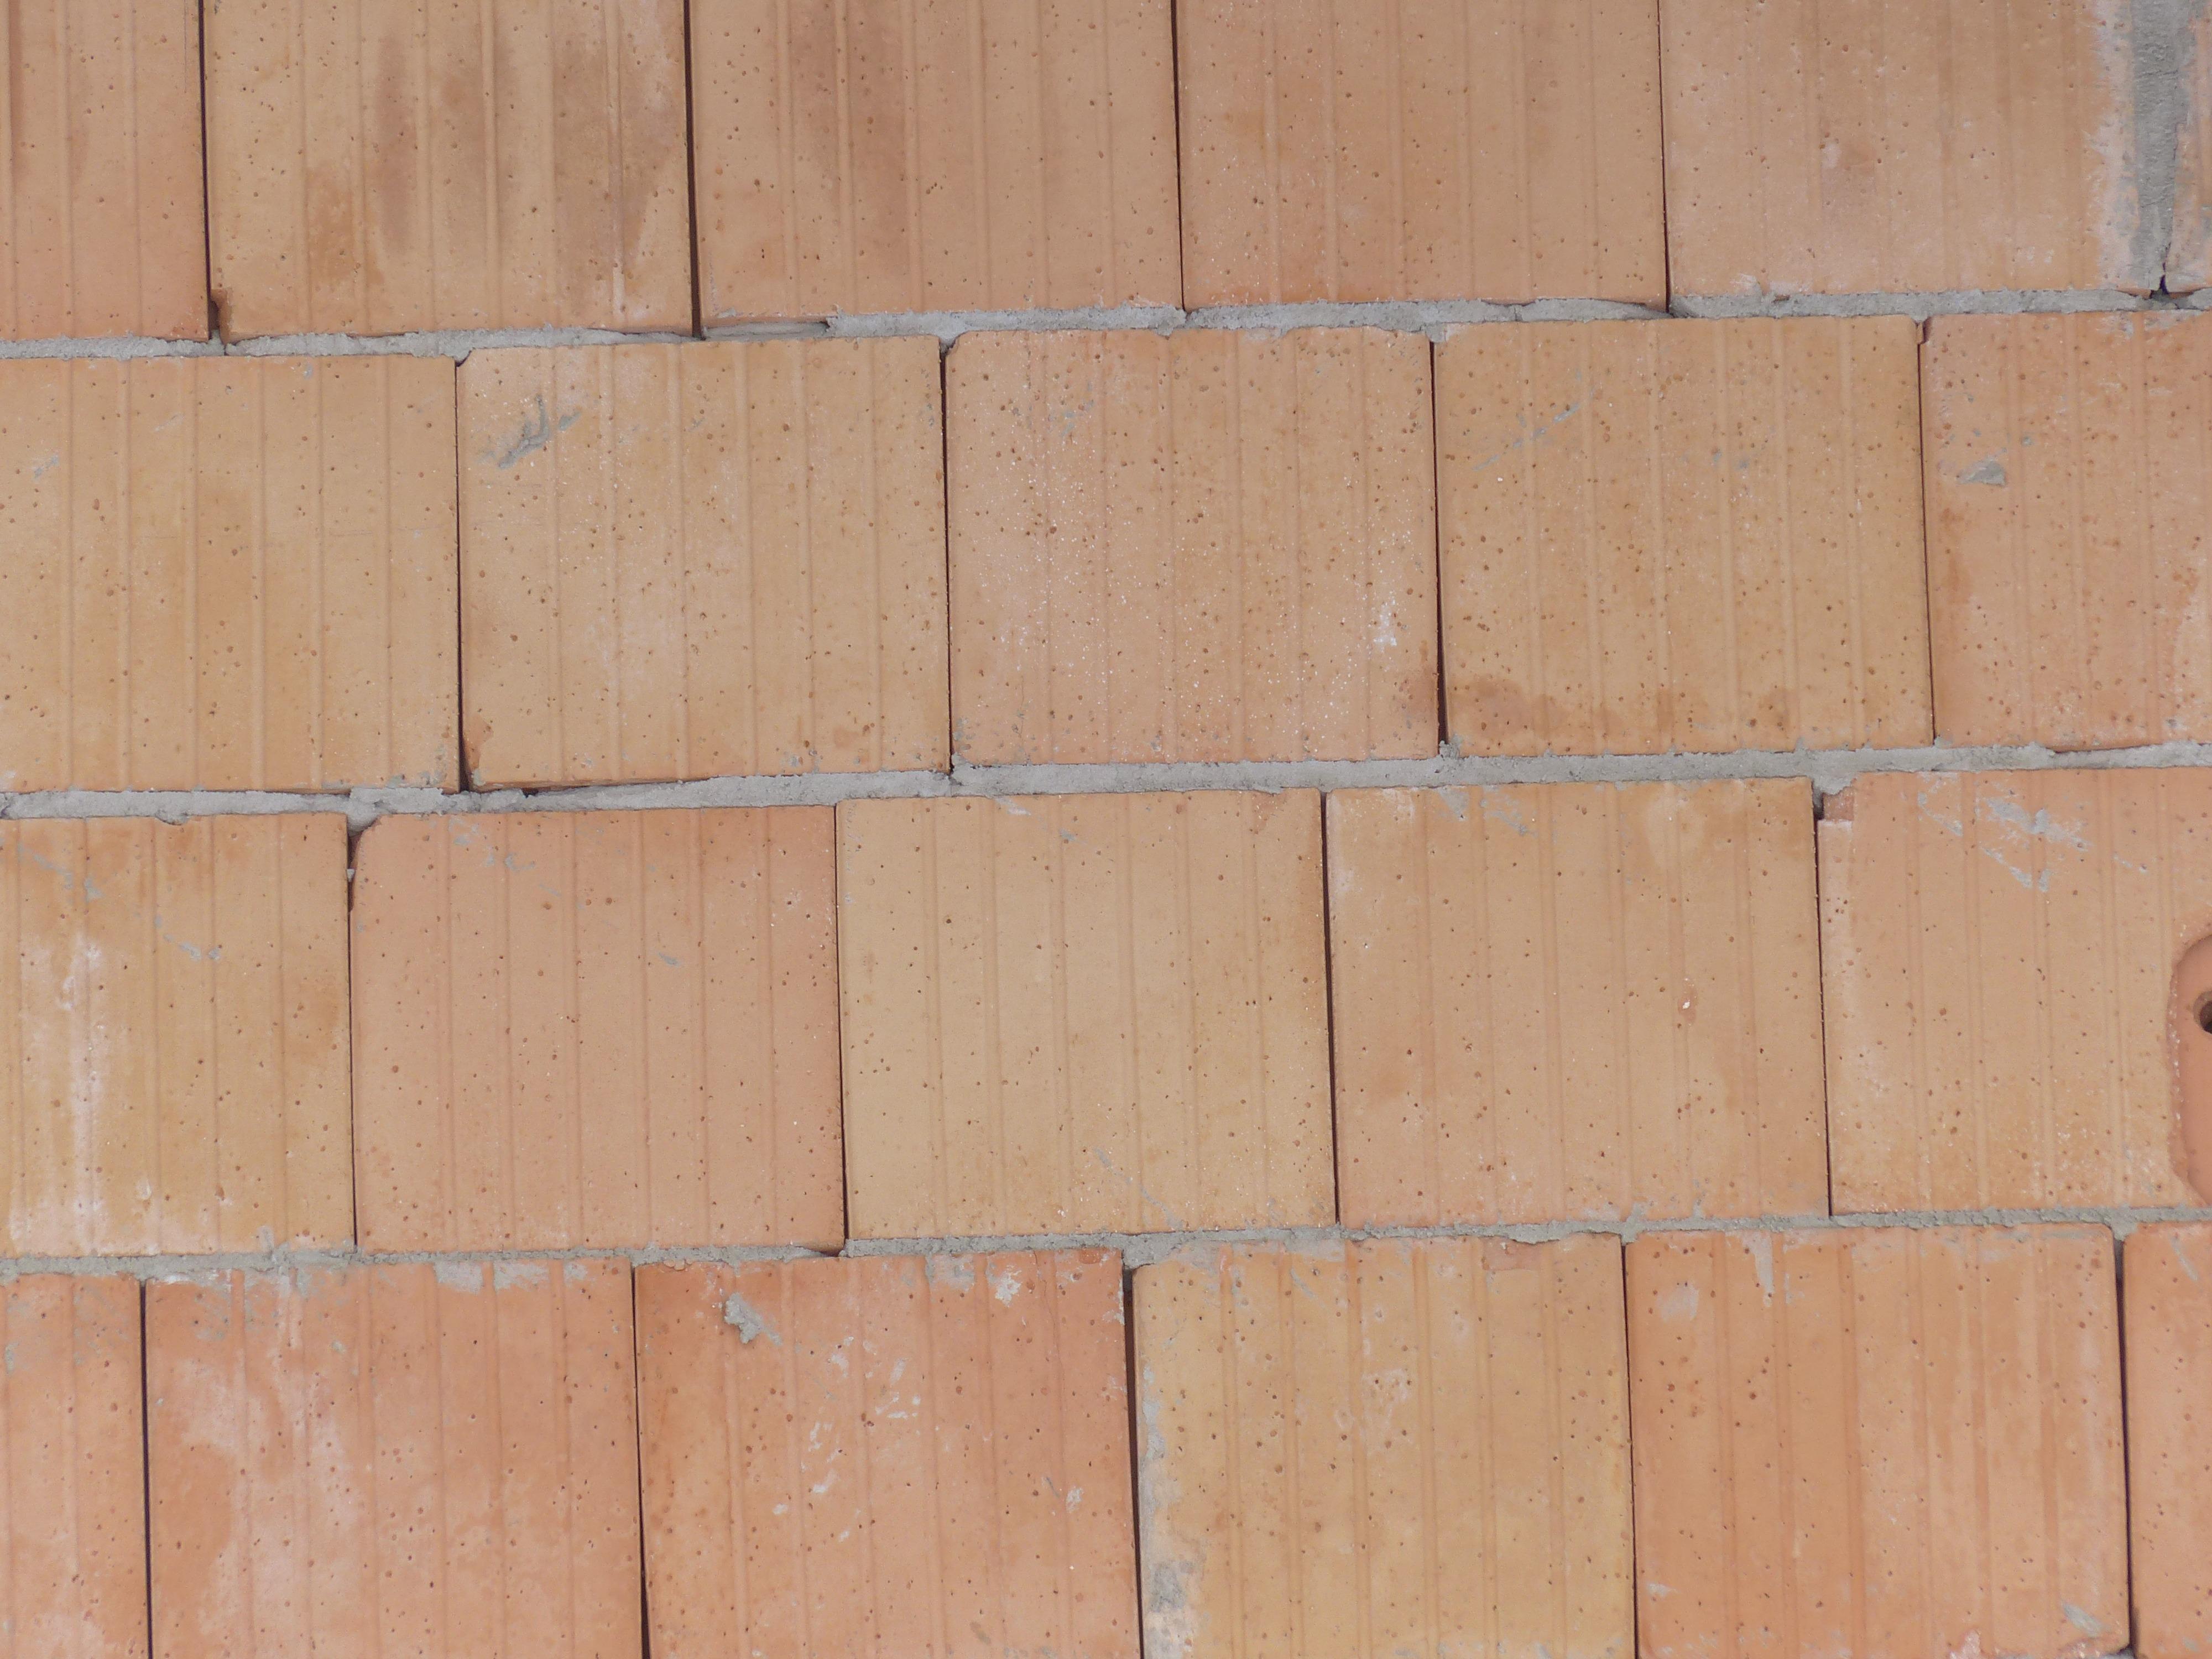 Wood Floor Home Wall Tile Brick Lumber S Hardwood New Raw Build Bricked Flooring Unshrouded Plywood